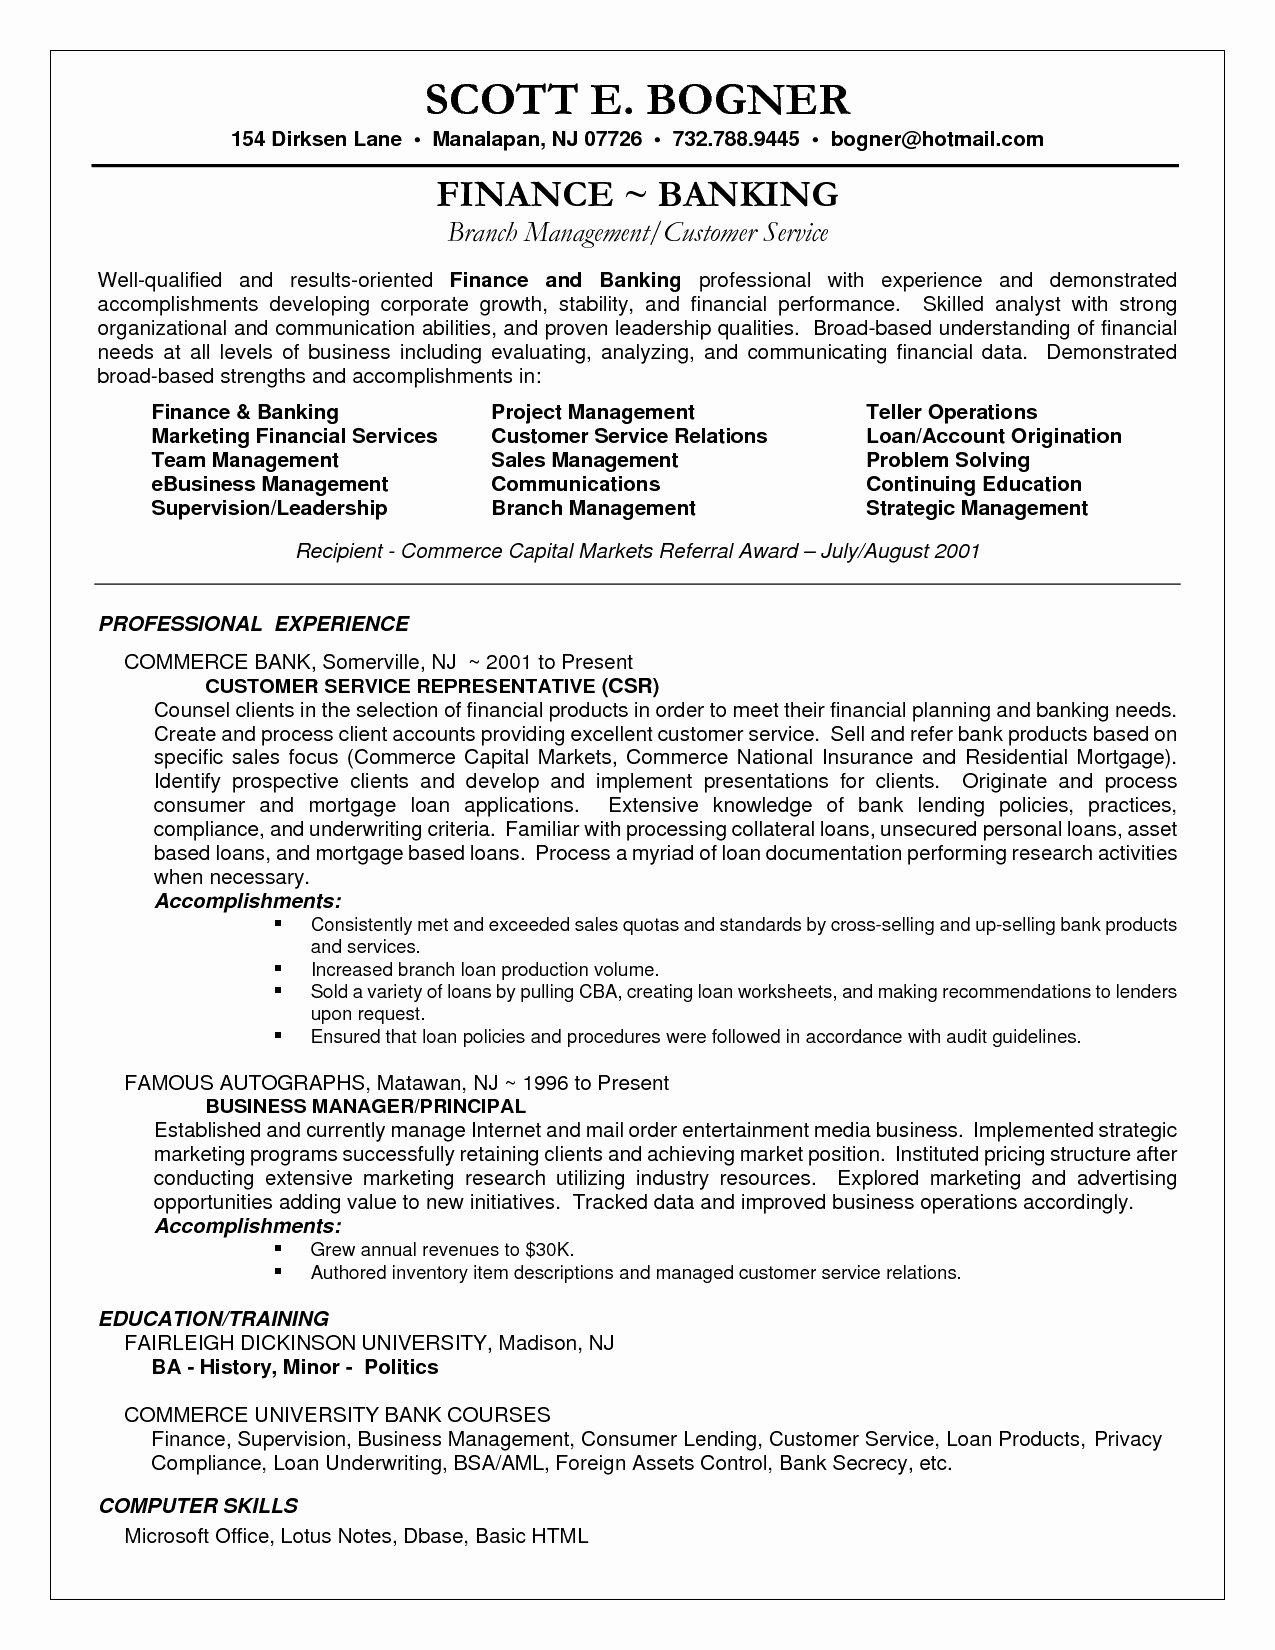 Resume Summary Statement Finance